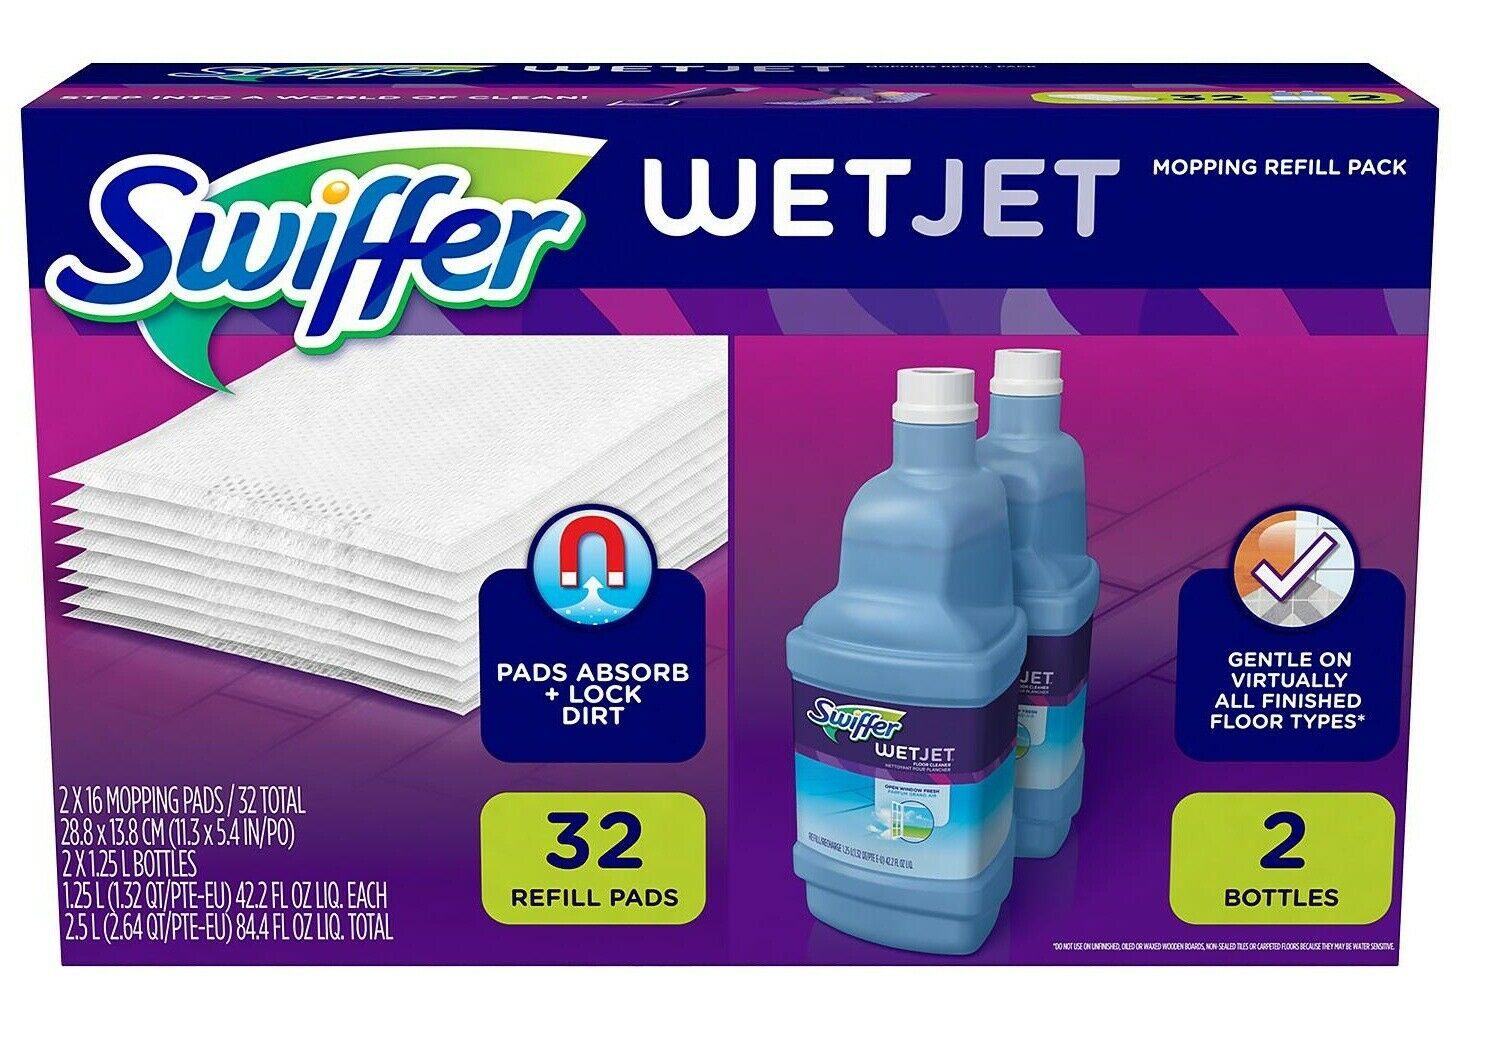 Swiffer Wetjet Mopping Refill Pack